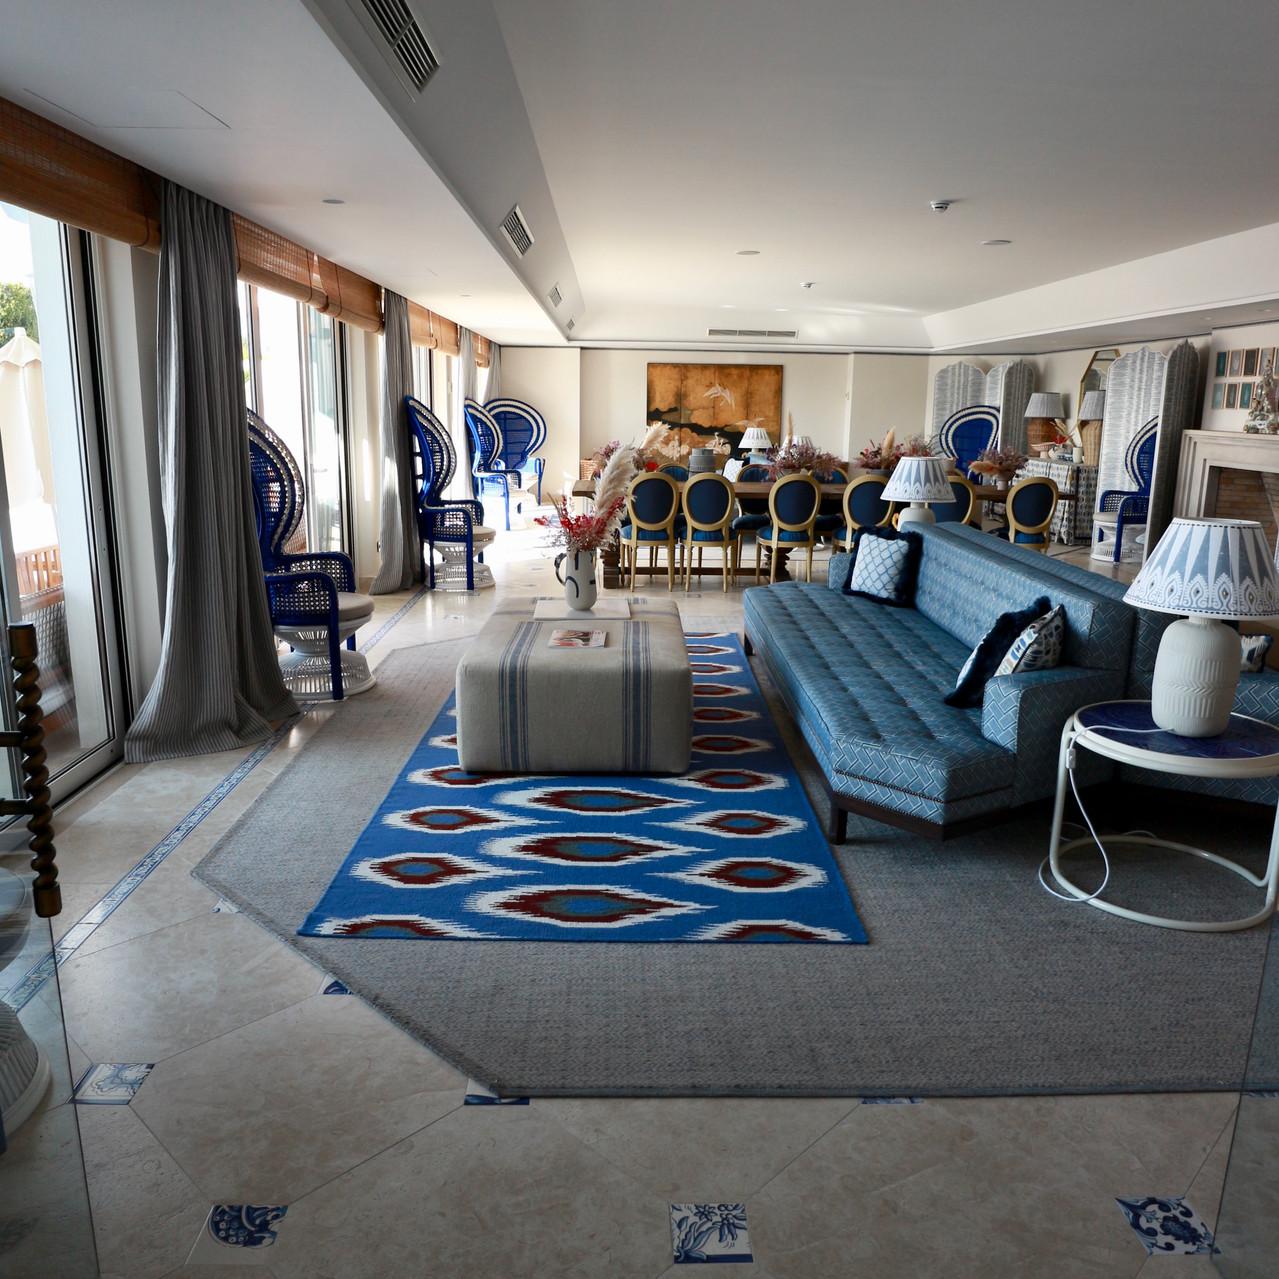 Lobby area - the Albatroz hotel